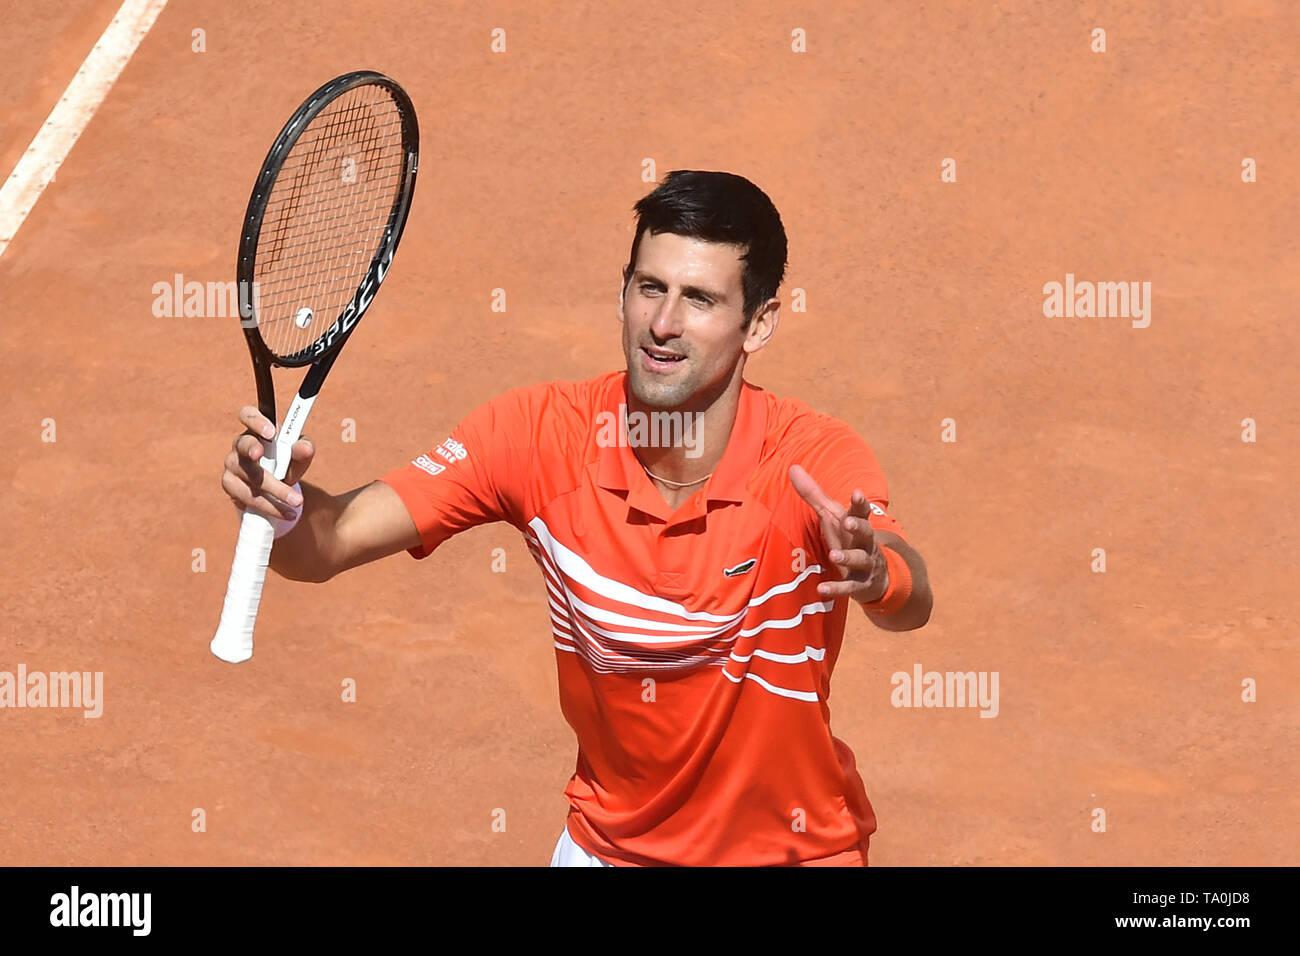 Novak Djokovic of Serbia  in action during the match against Denis Shapovalov of Canada. Roma 16-05-2018 Foro Italico   Internazionali BNL D'Italia It - Stock Image